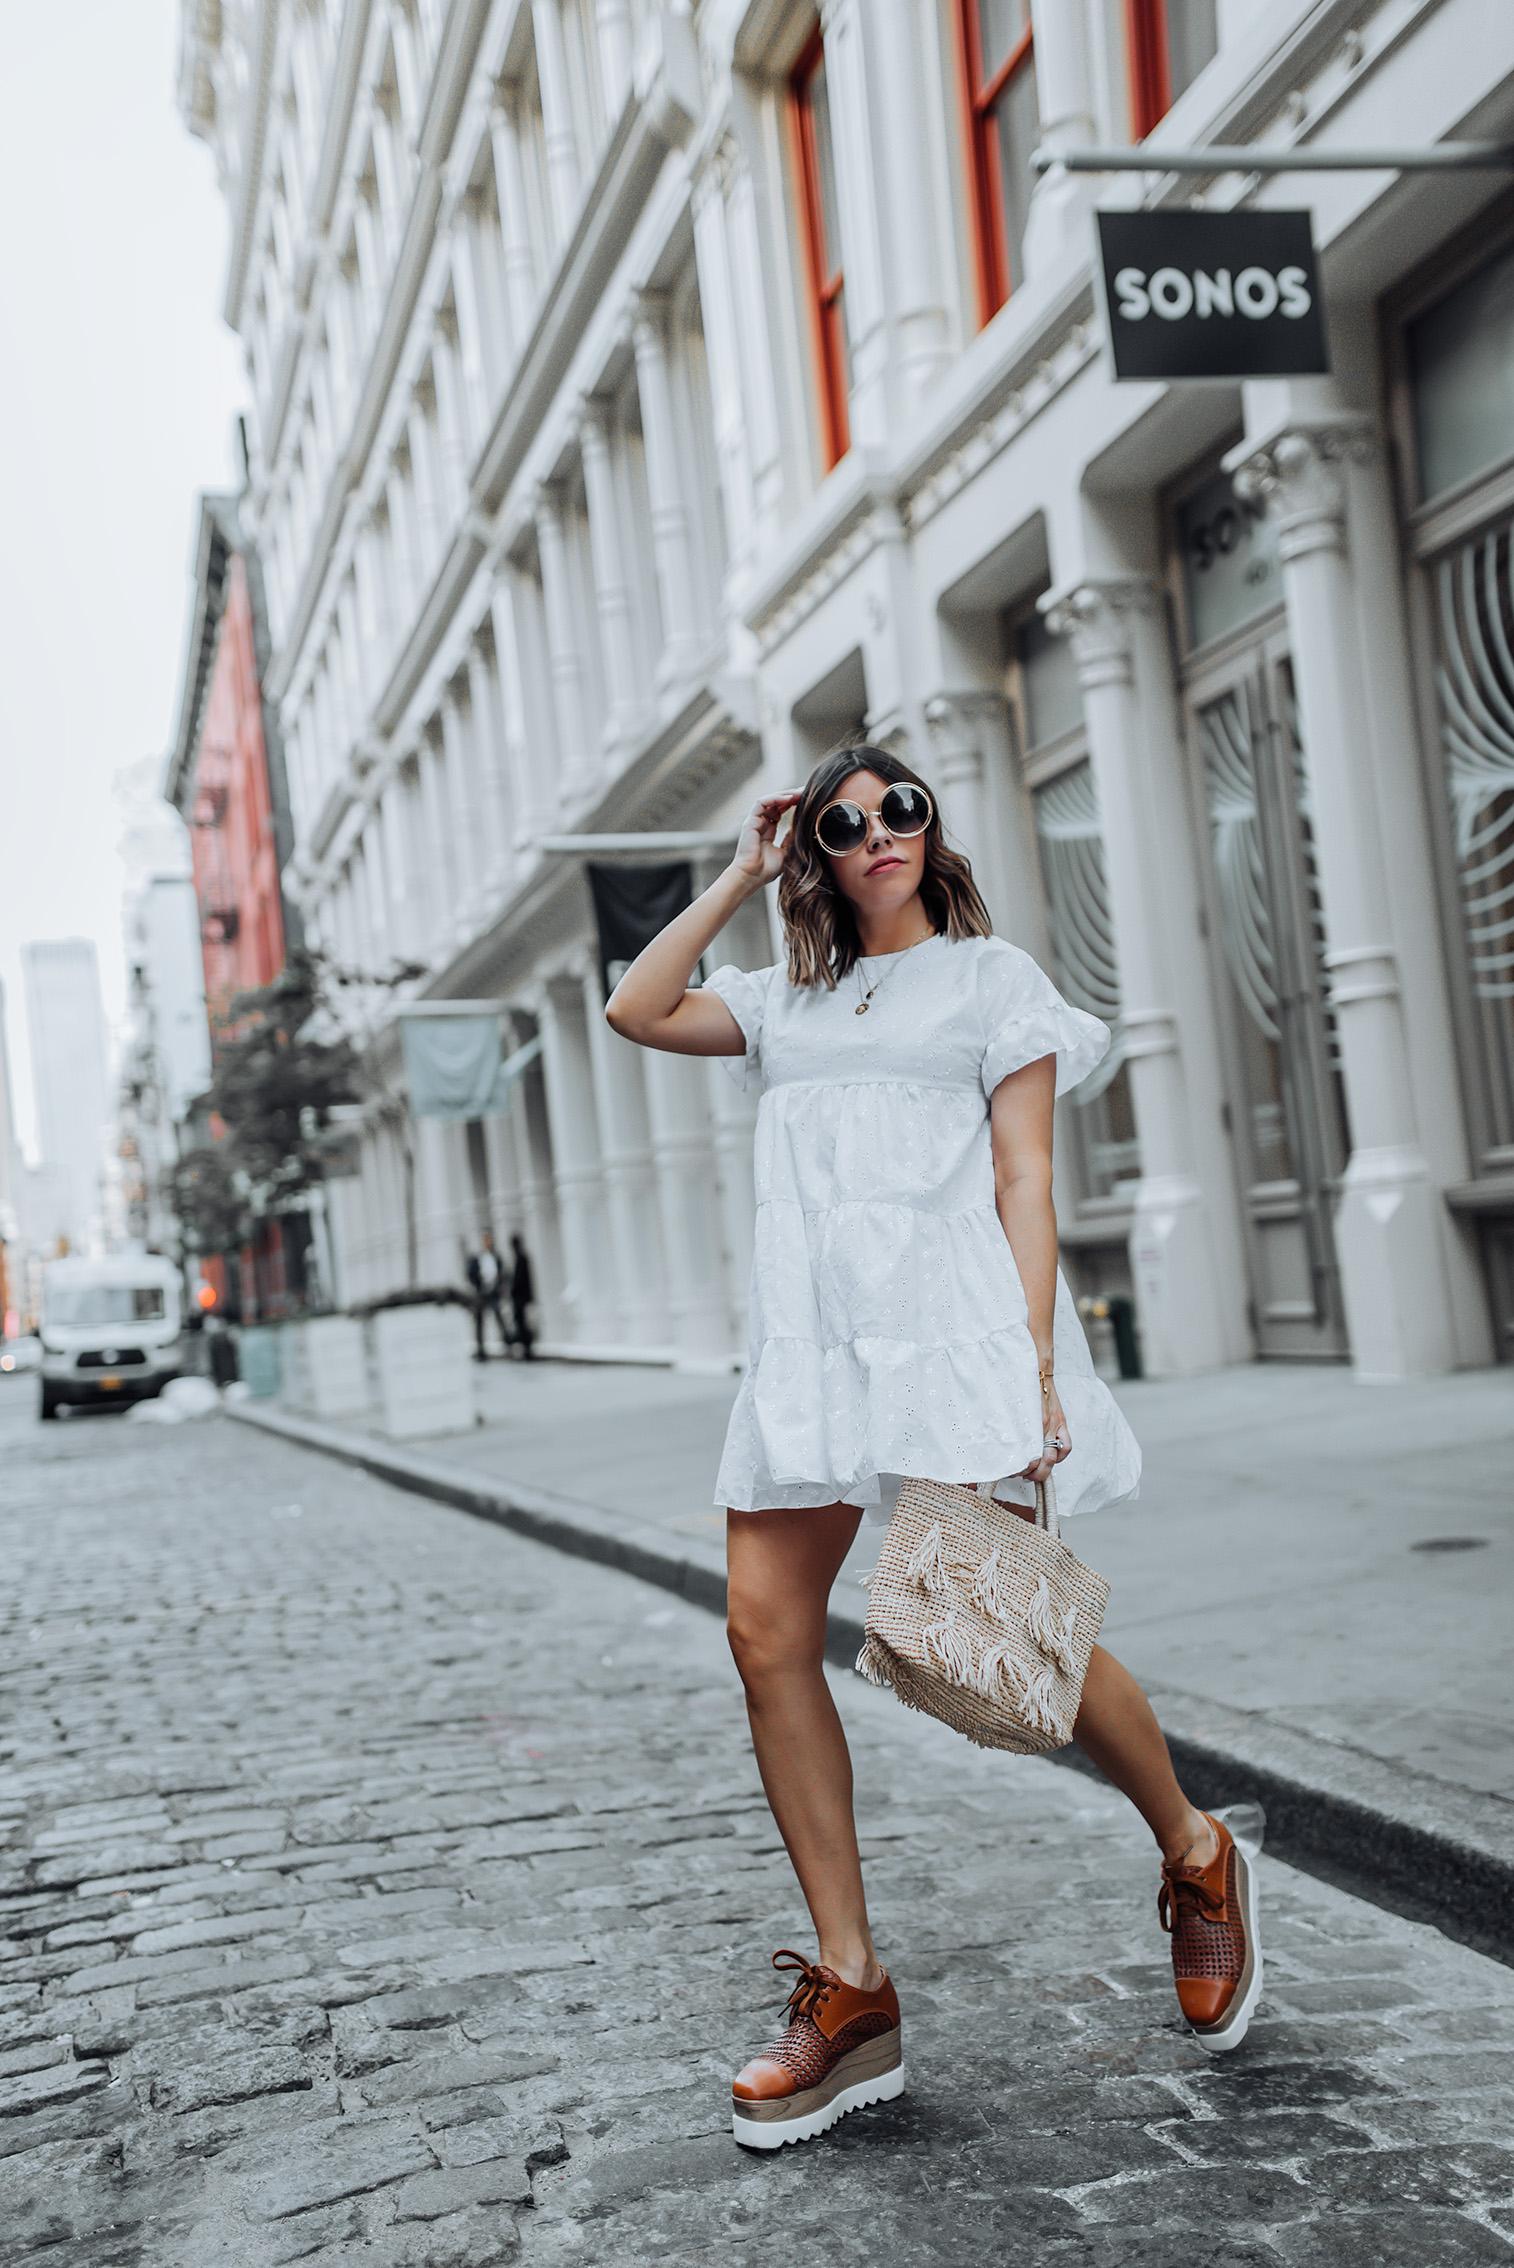 Babydoll dress | Tassel Bag | Sunnies | #liketkit #LWD #casualoutfits #streetstyle